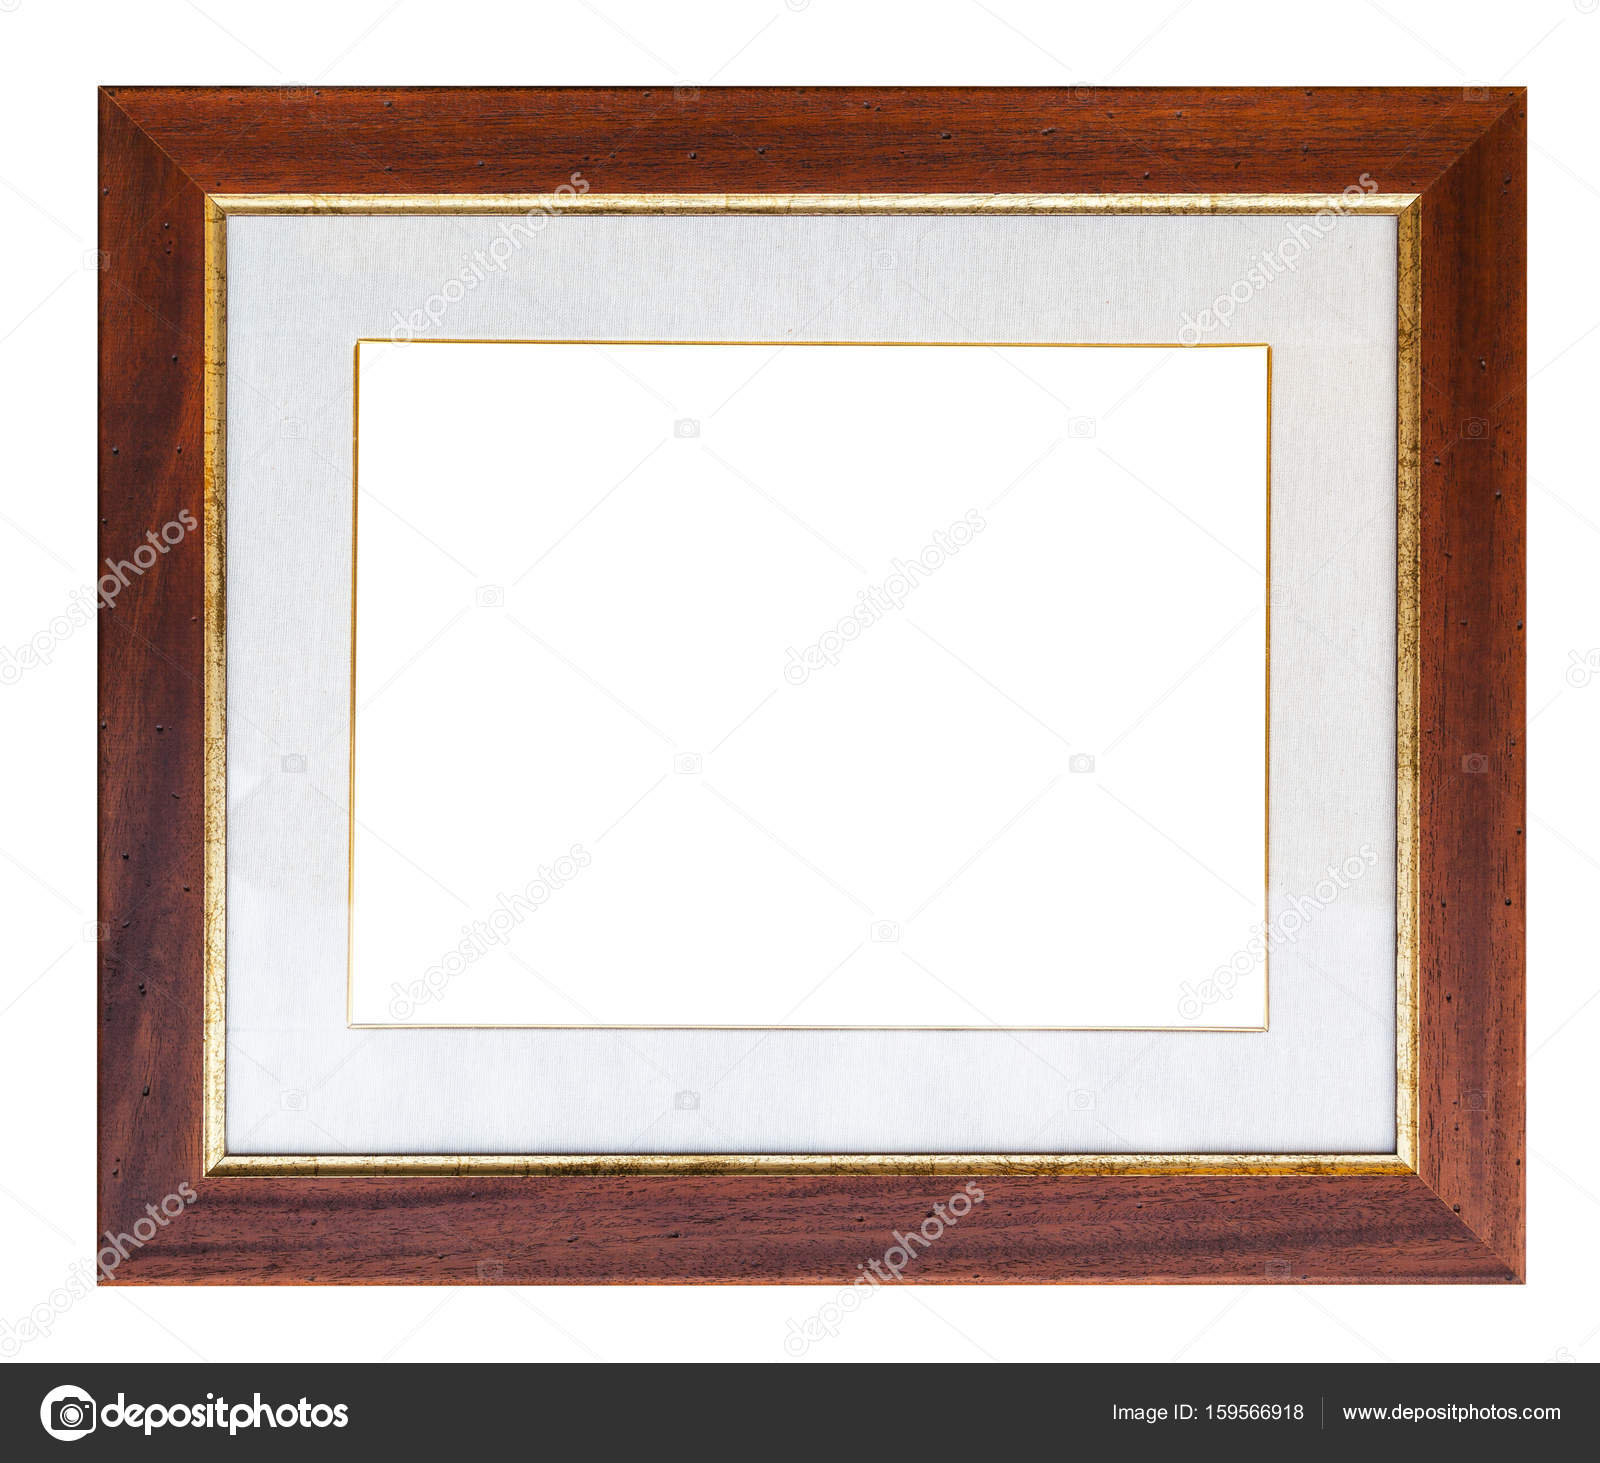 marco de madera ancho marrón con picaporte — Foto de stock ...